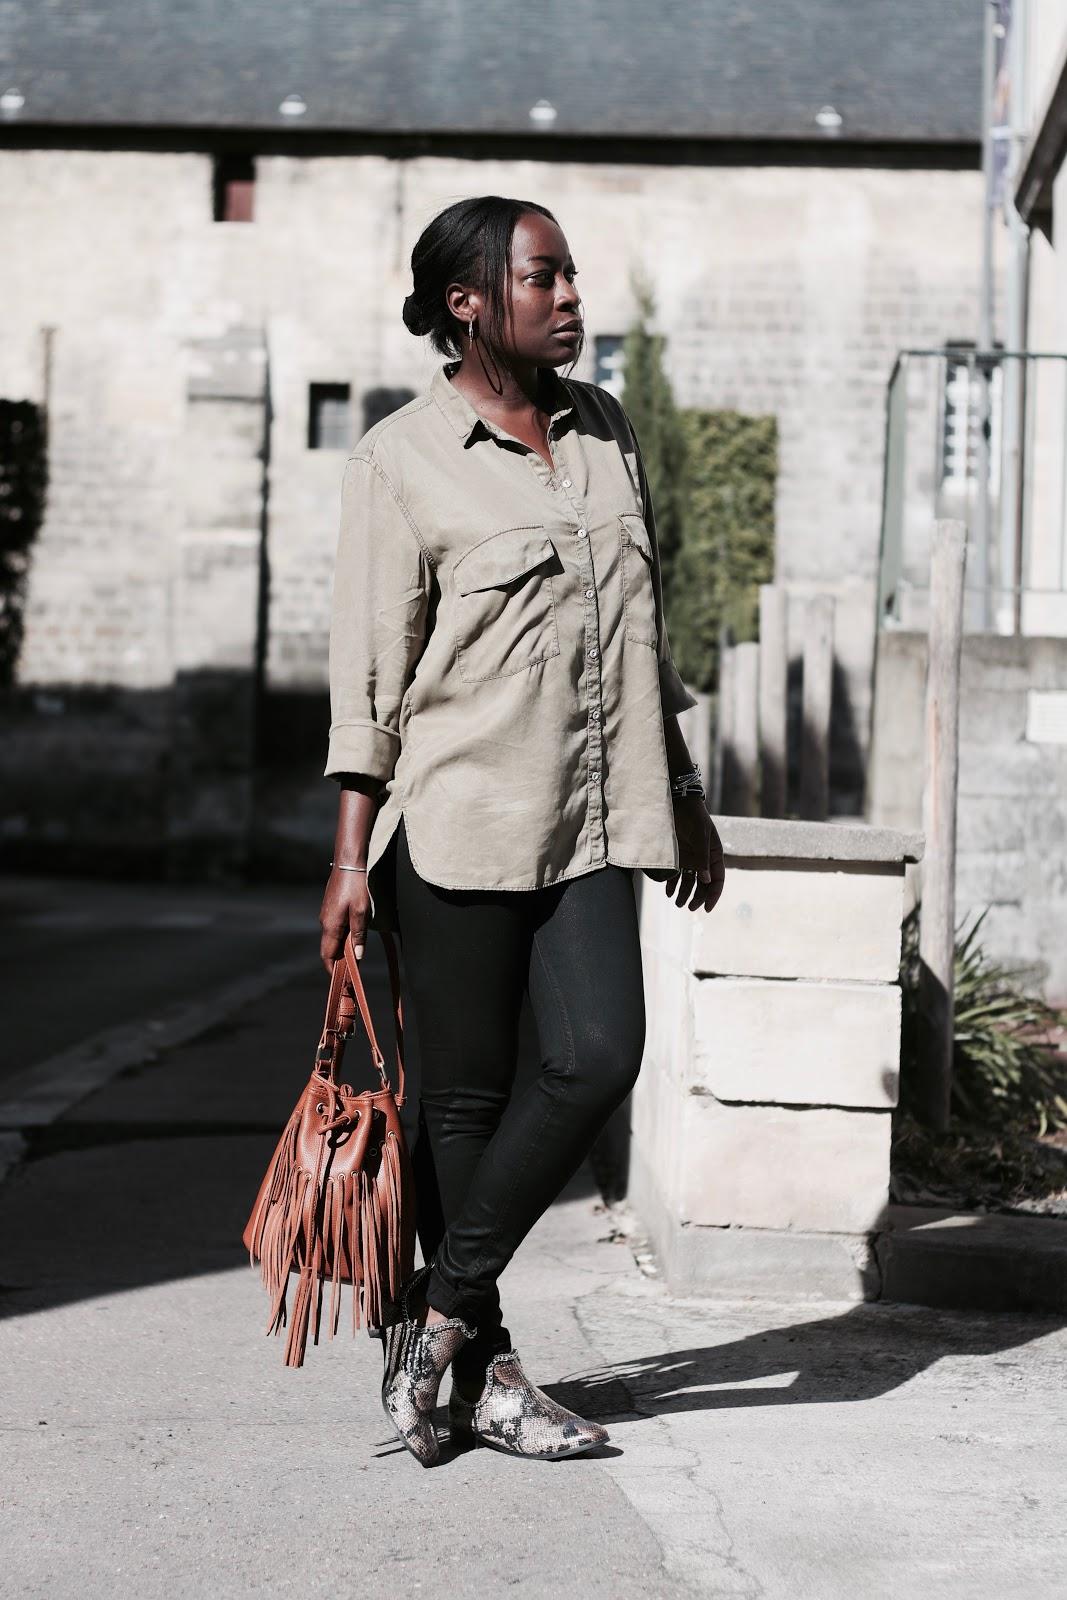 chemise-kaki-casual-chic-blog-mode